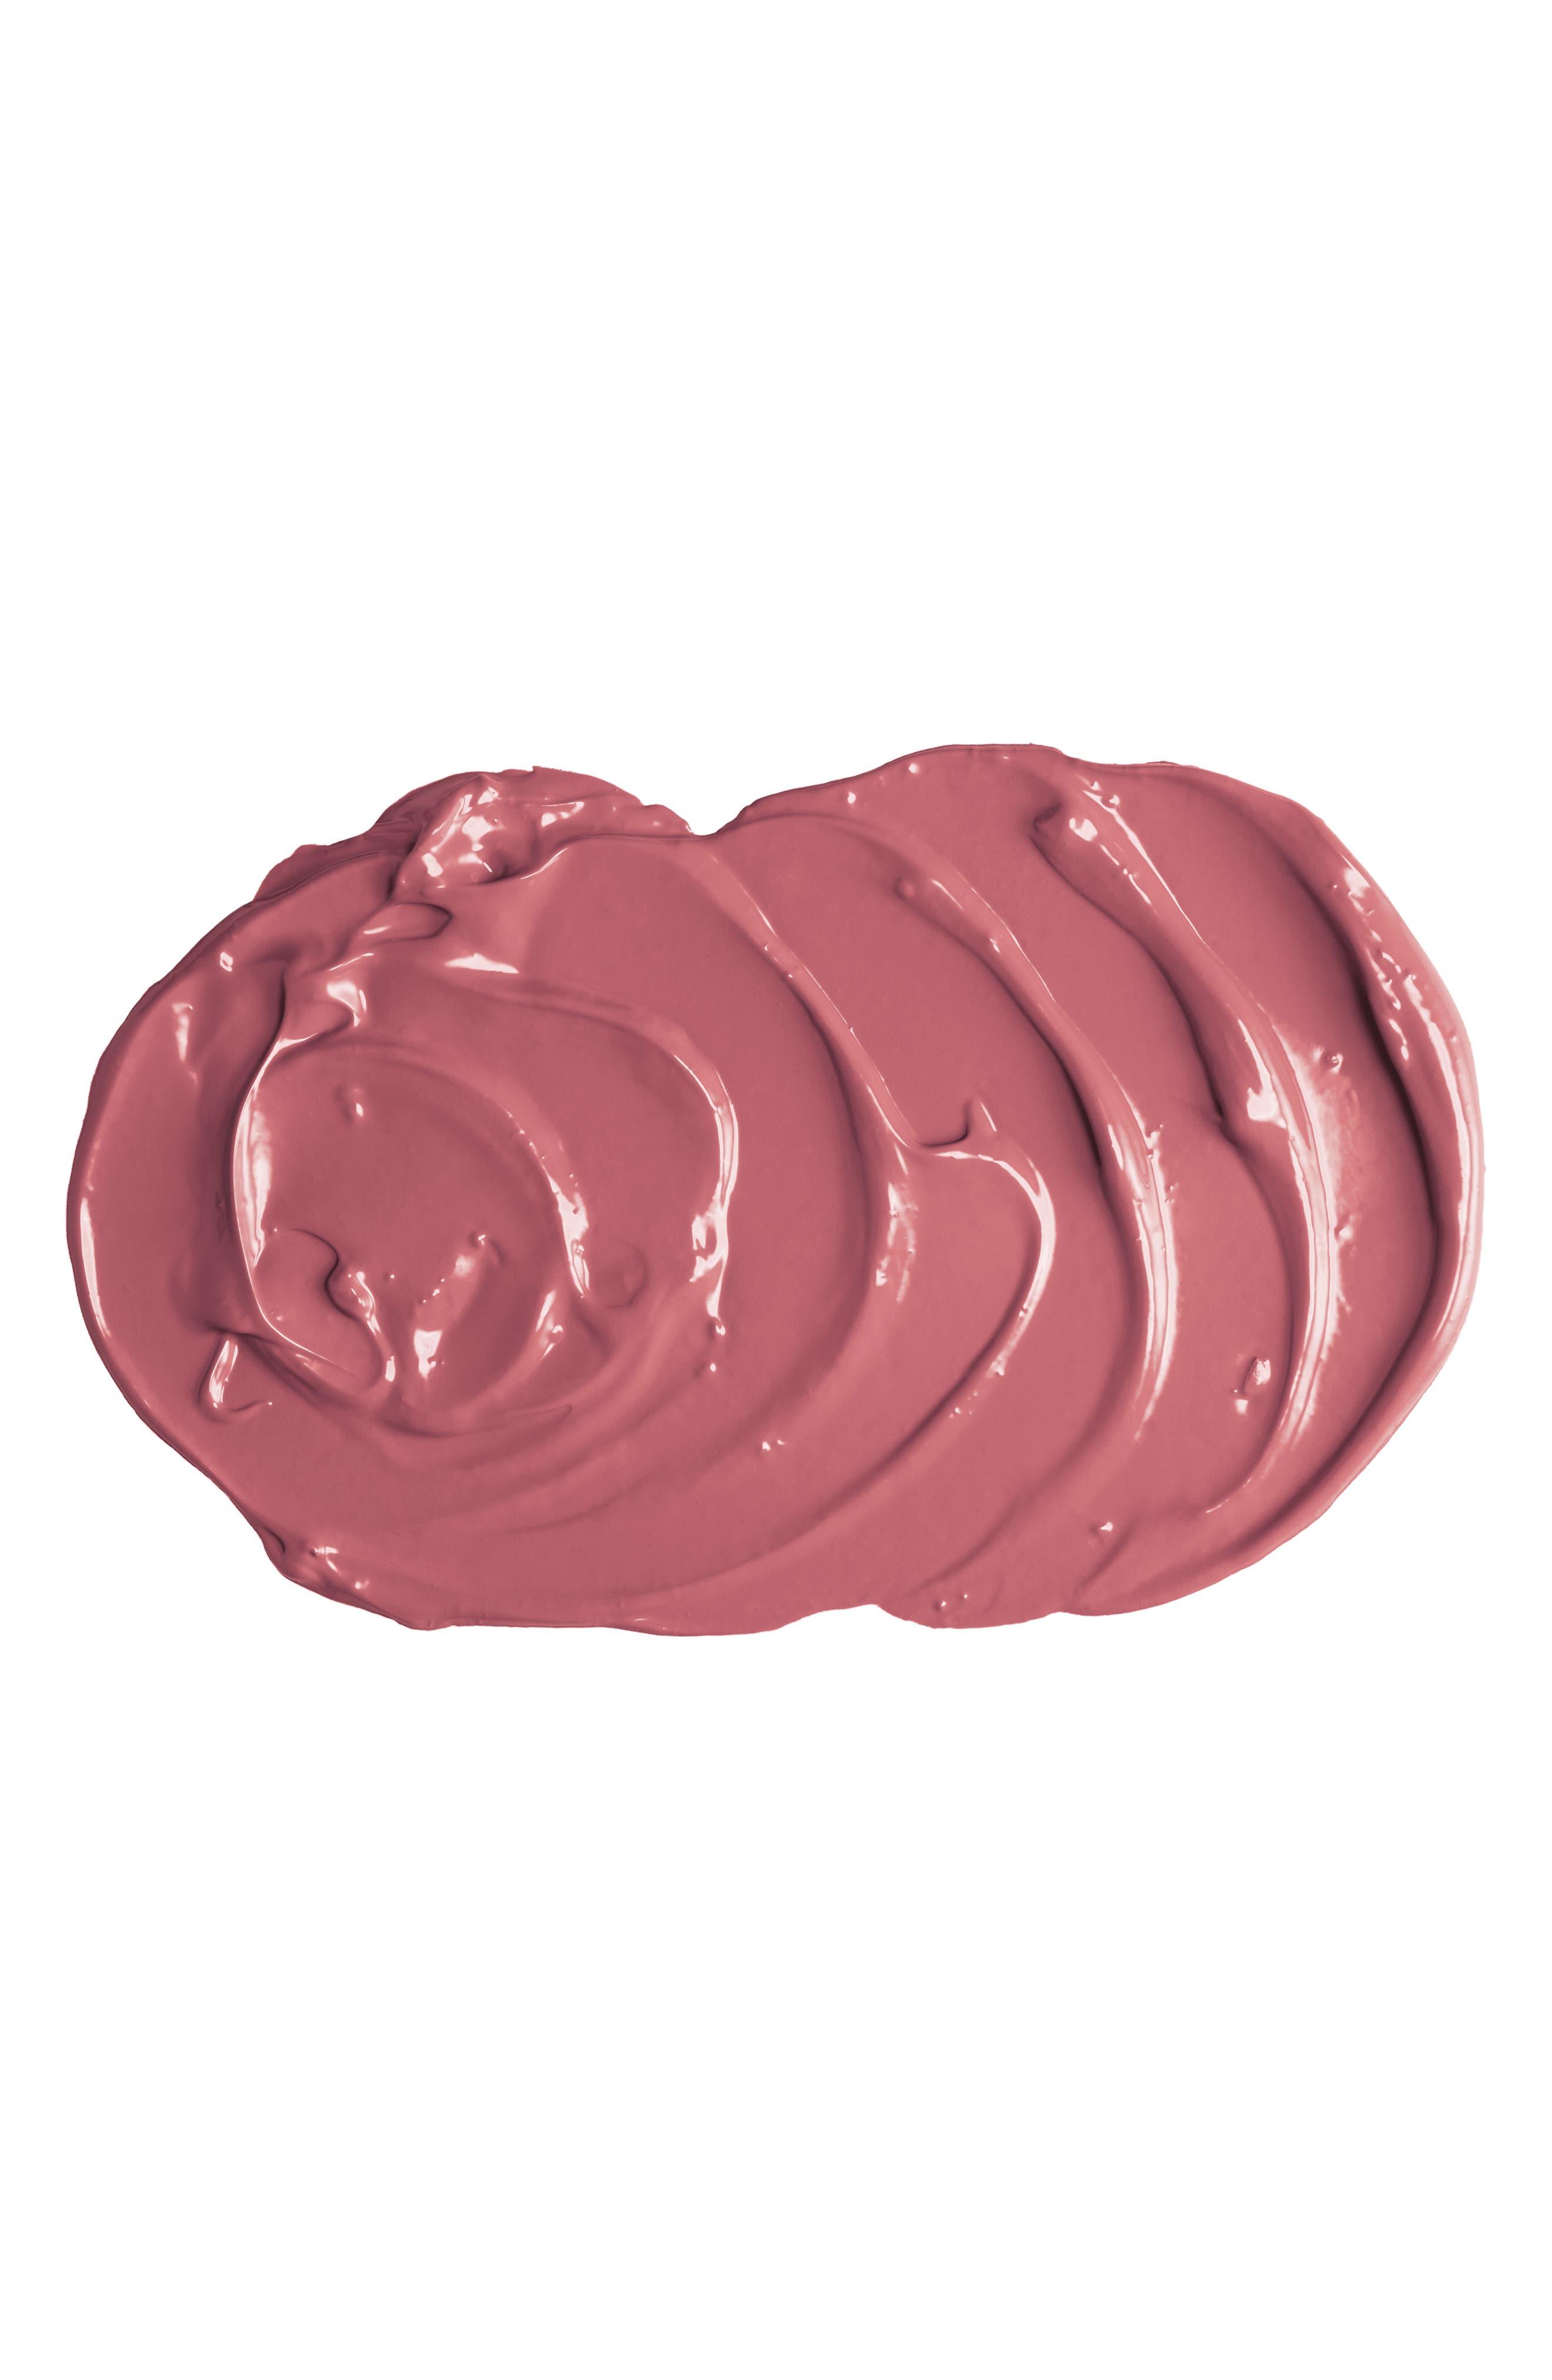 Nude for Summer Lip Kit,                             Alternate thumbnail 3, color,                             000